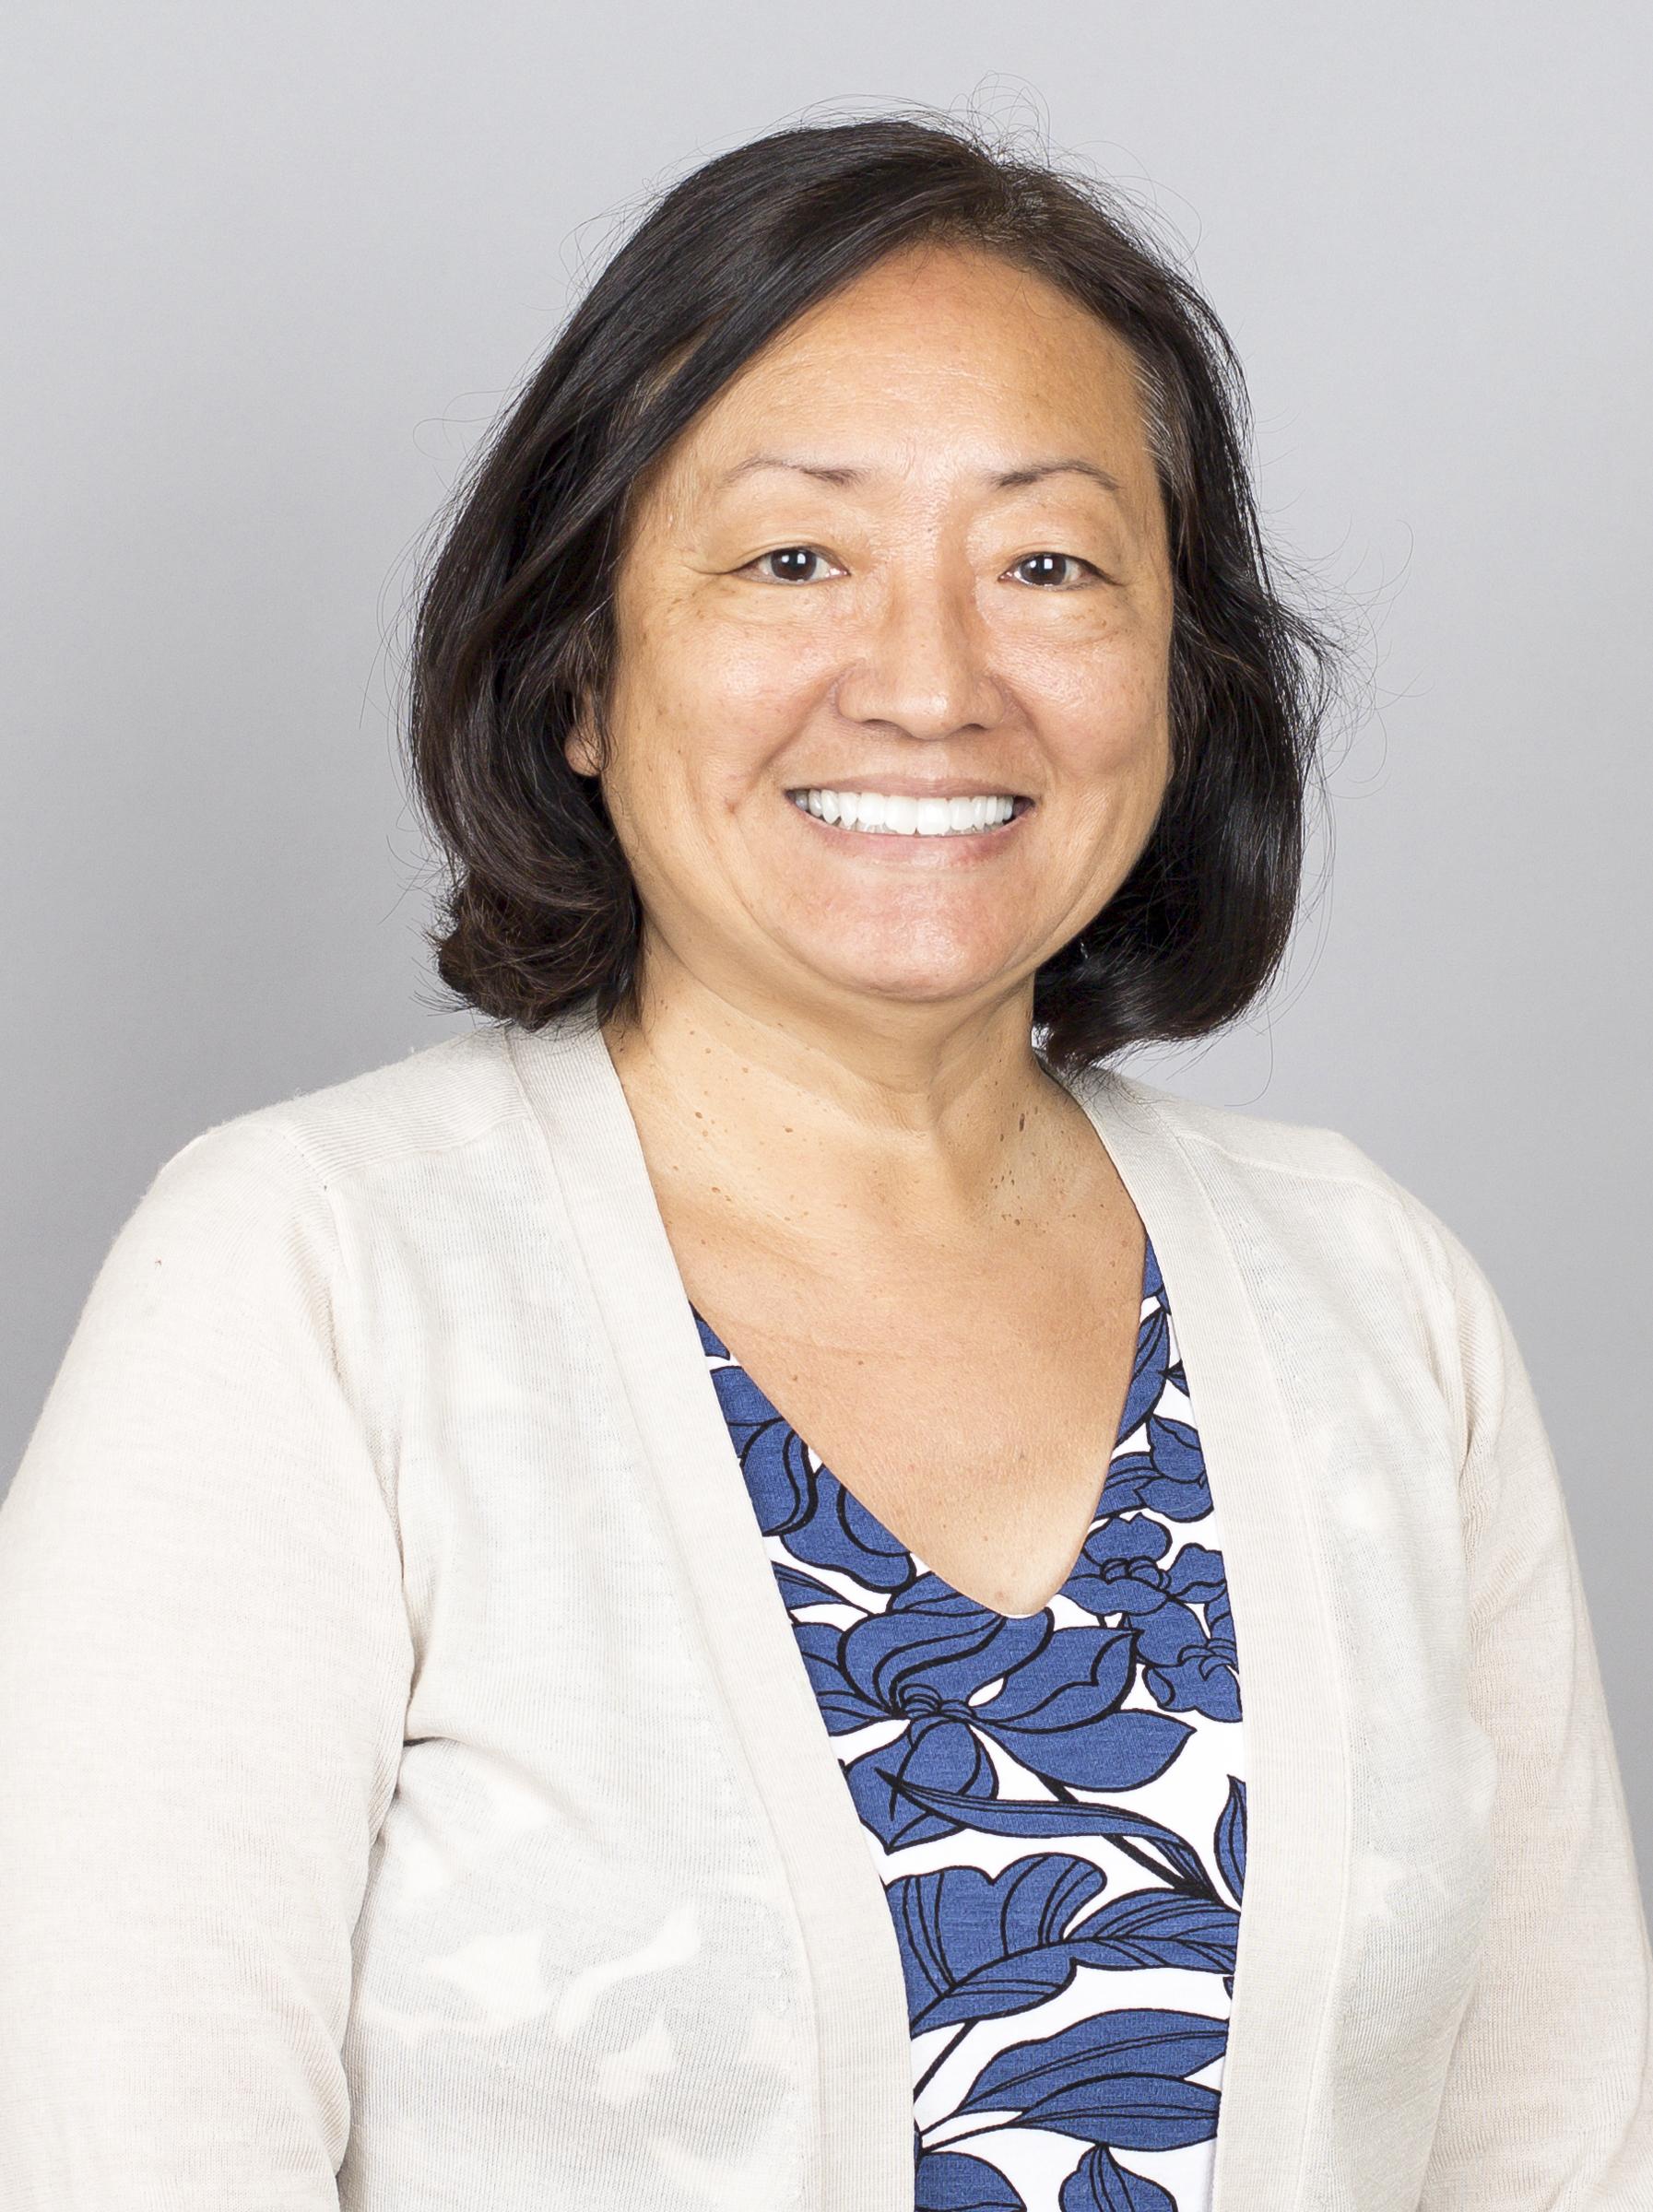 Caren Chang - CO-DIRECTOR, COLLEGE OF COMPUTER, MATHEMATICAL AND NATURAL SCIENCEScarenc@umd.edu